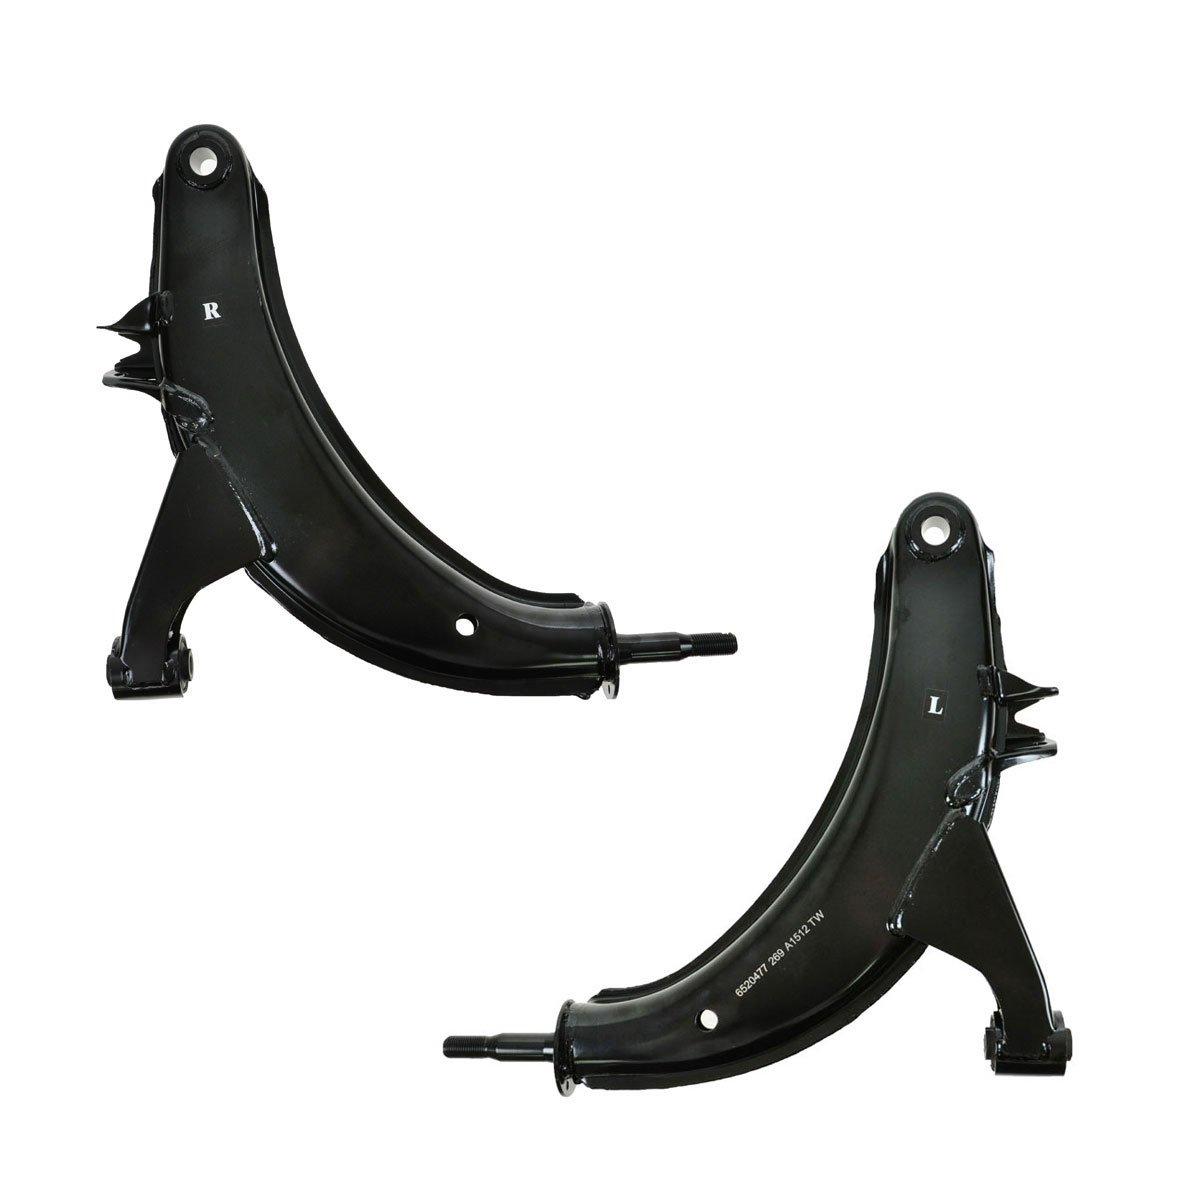 Front Lower Control Arm Pair Set Of 2 Lh Rh For Baja 2011 Honda Ridgeline Suspension Left W0133 Forester Impreza Legacy Automotive